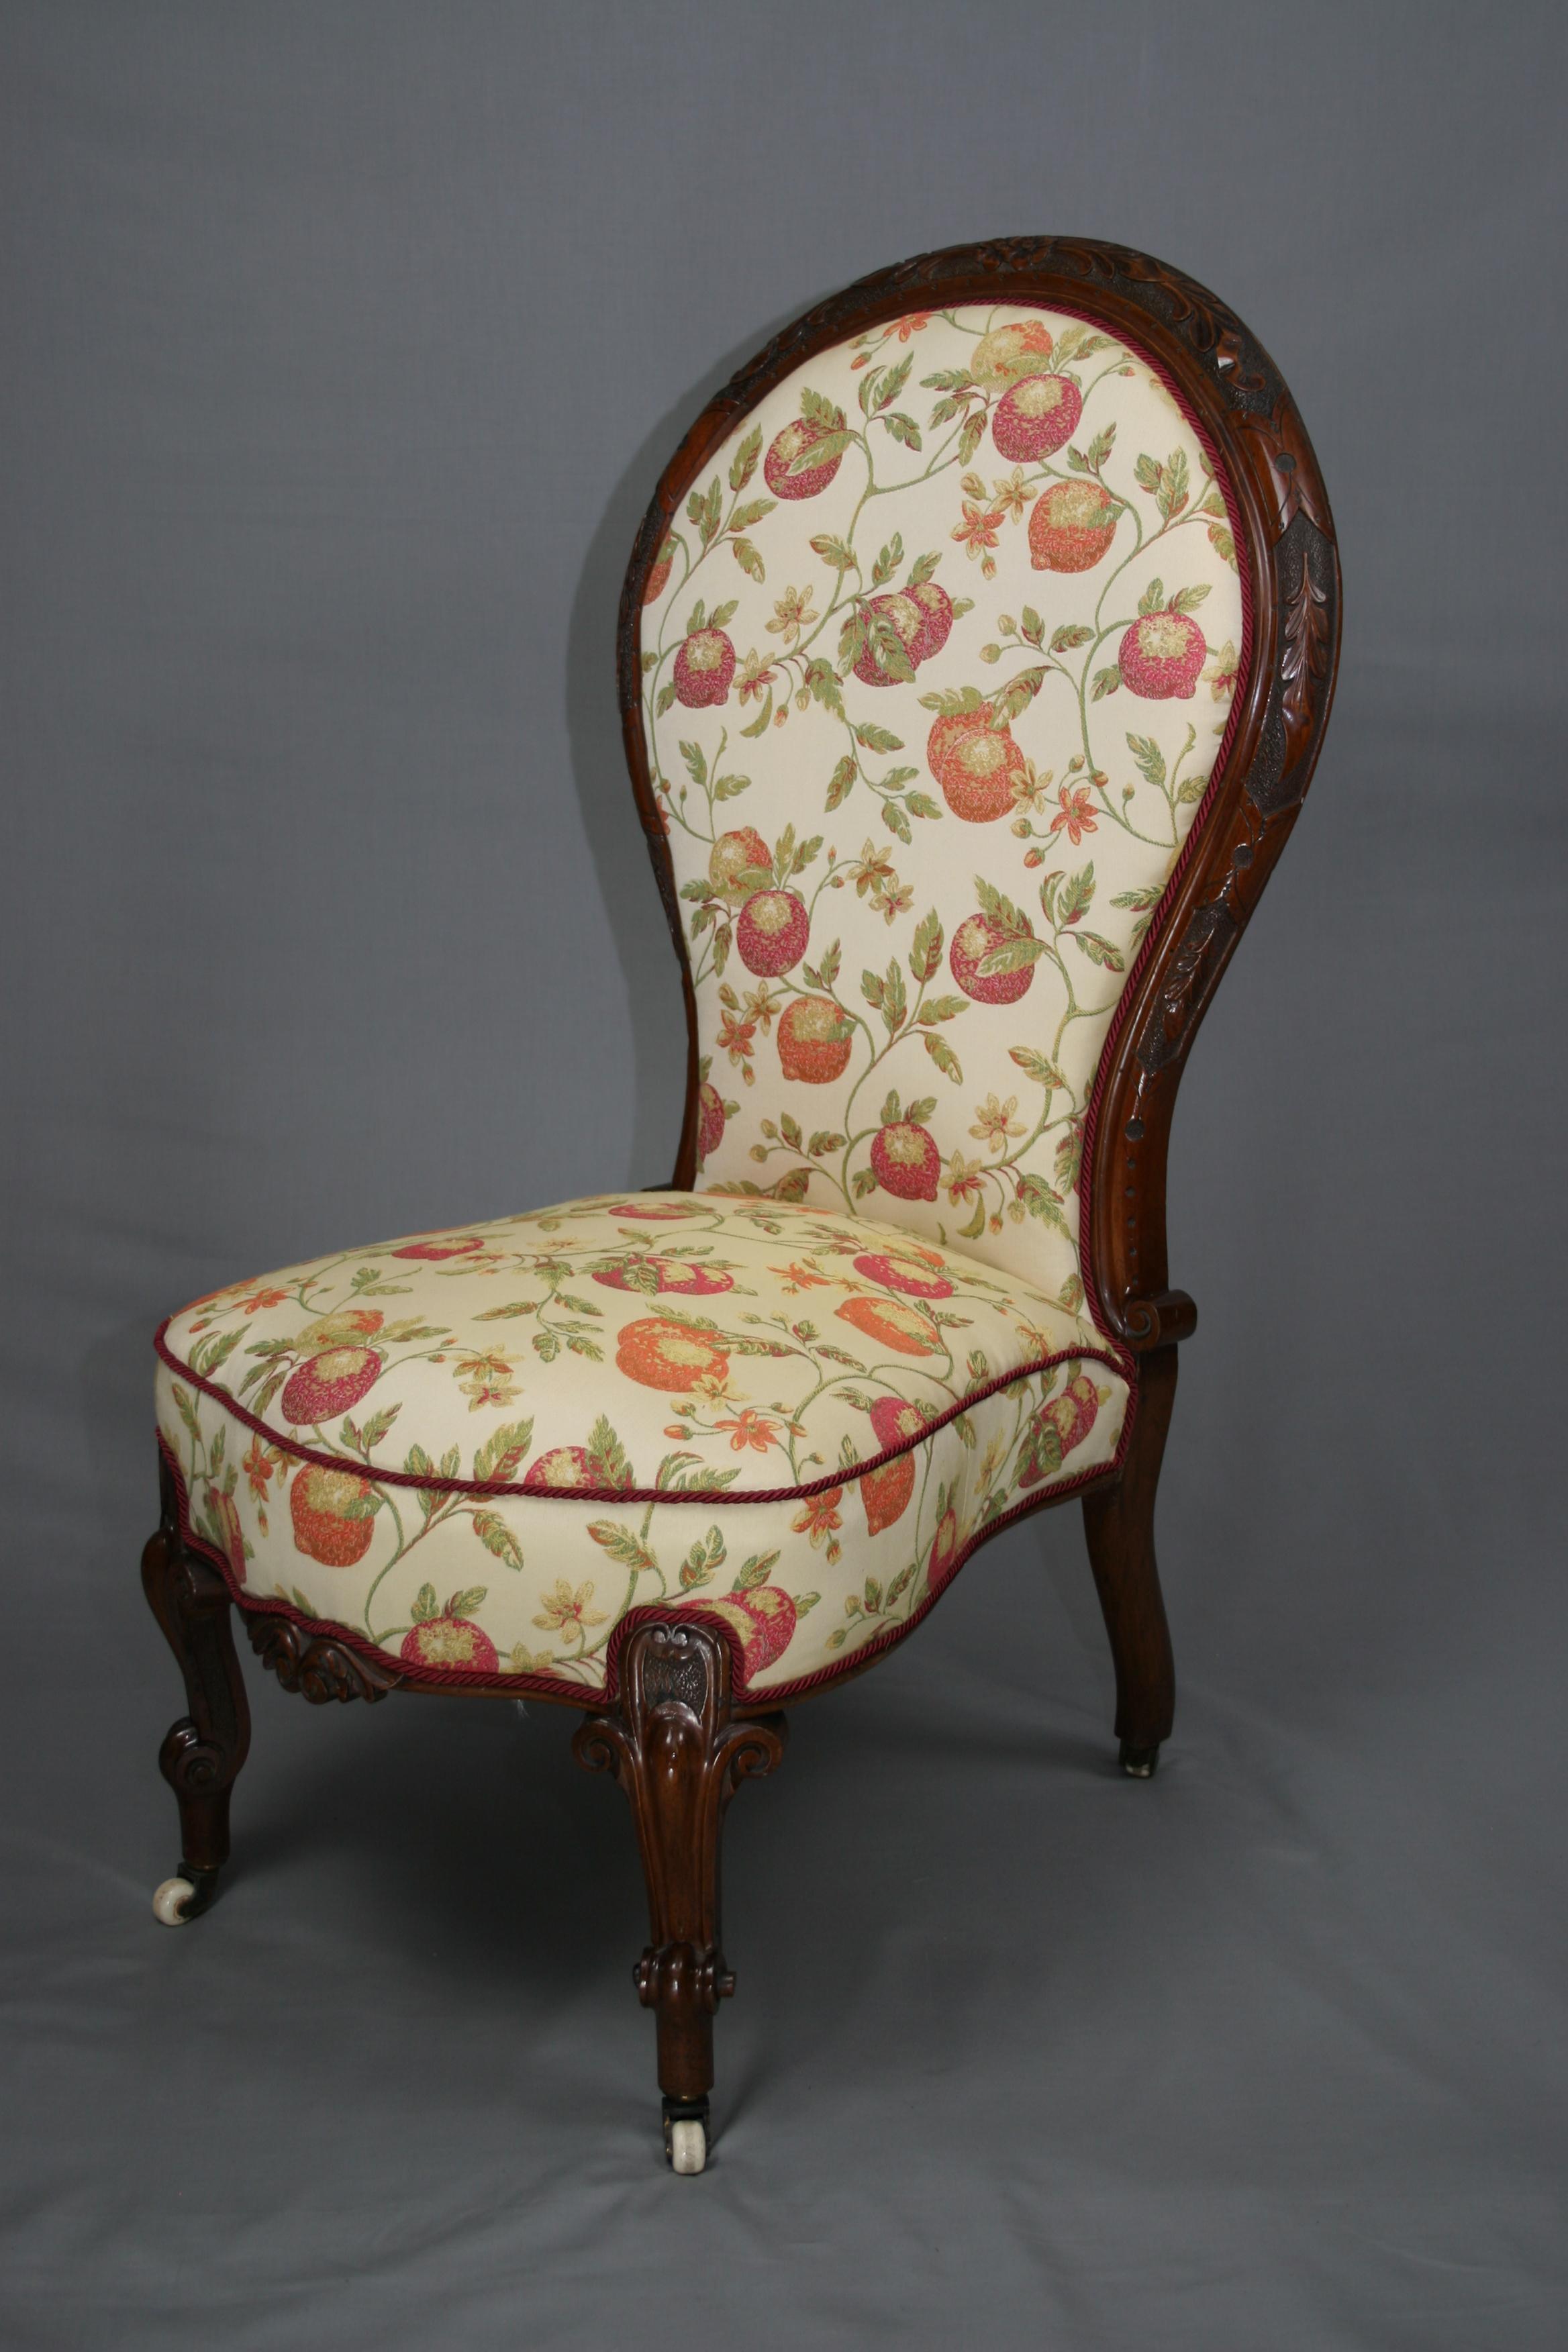 Antique nursing chair - Antique Victorian Mahogany Nursing Chair